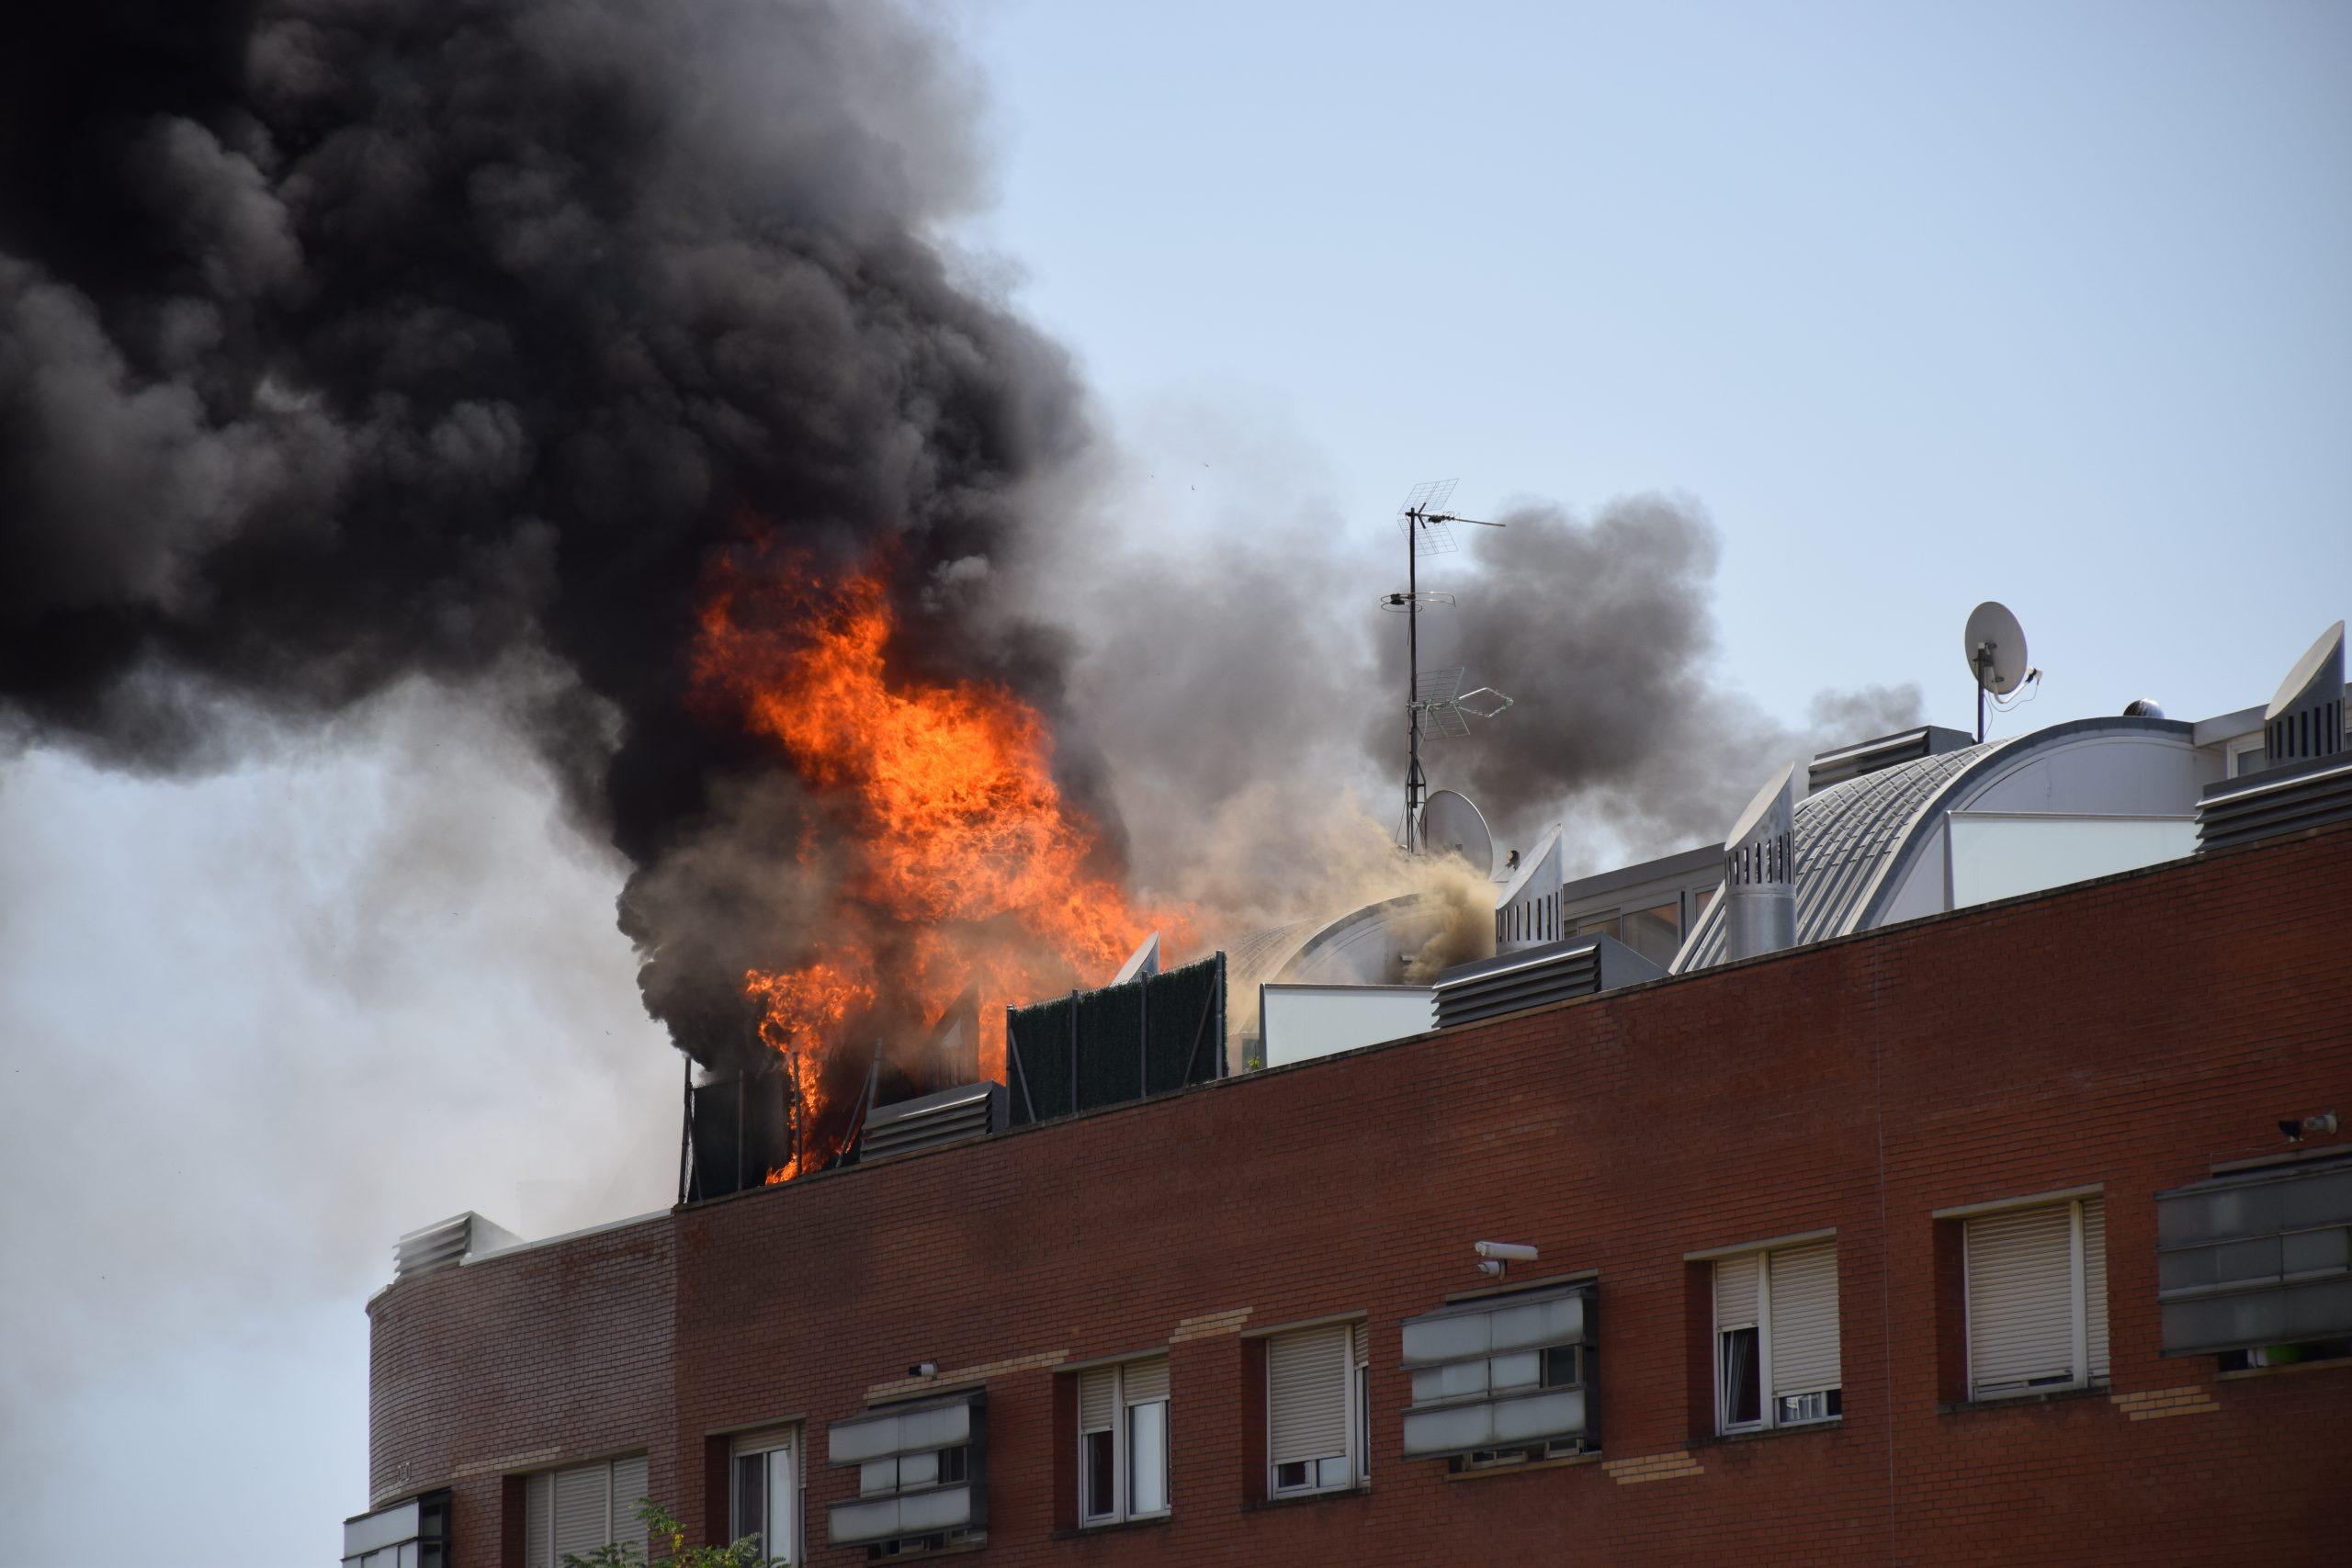 Incendi en un edifici de l'avinguda Béjar de Terrassa | Anna Gimferrer